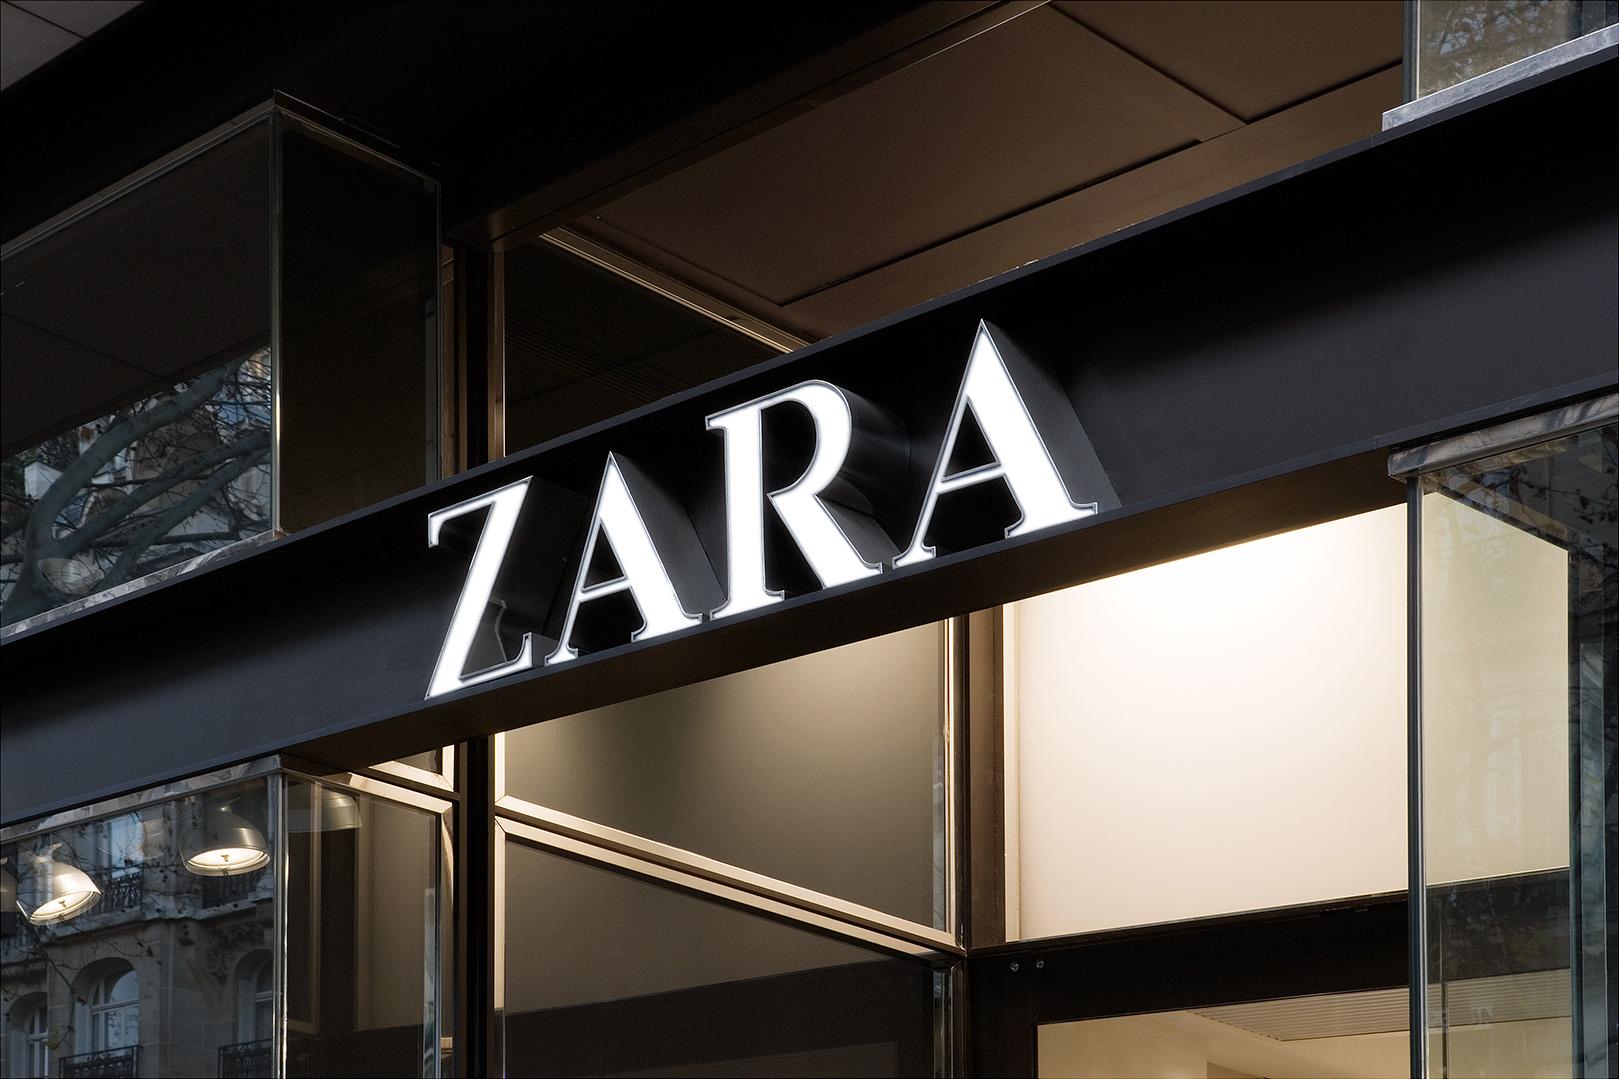 12ea21d4ef Πωλητές και Ταμίες ζητούνται από το νέο κατάστημα ZARA στο Αιγάλεω ...